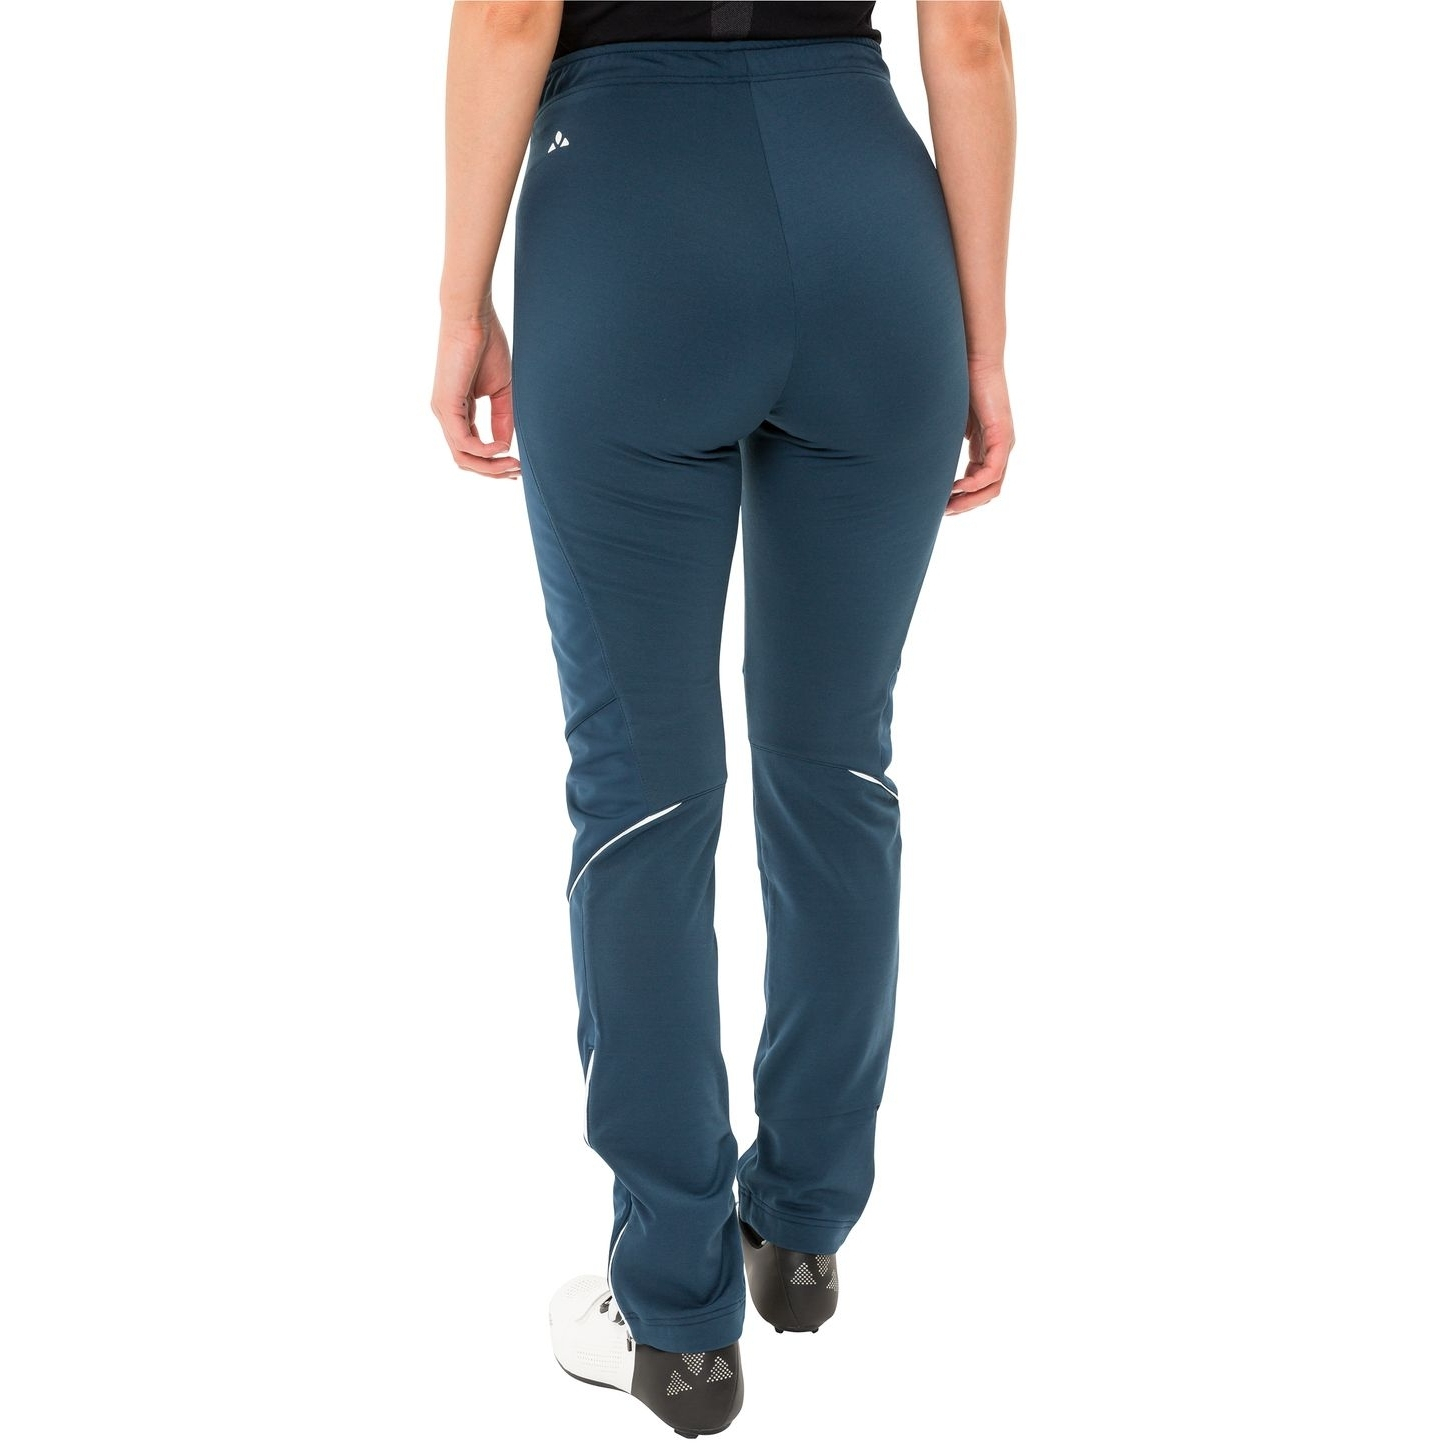 Image of Vaude Women's Wintry Pants IV - dark sea